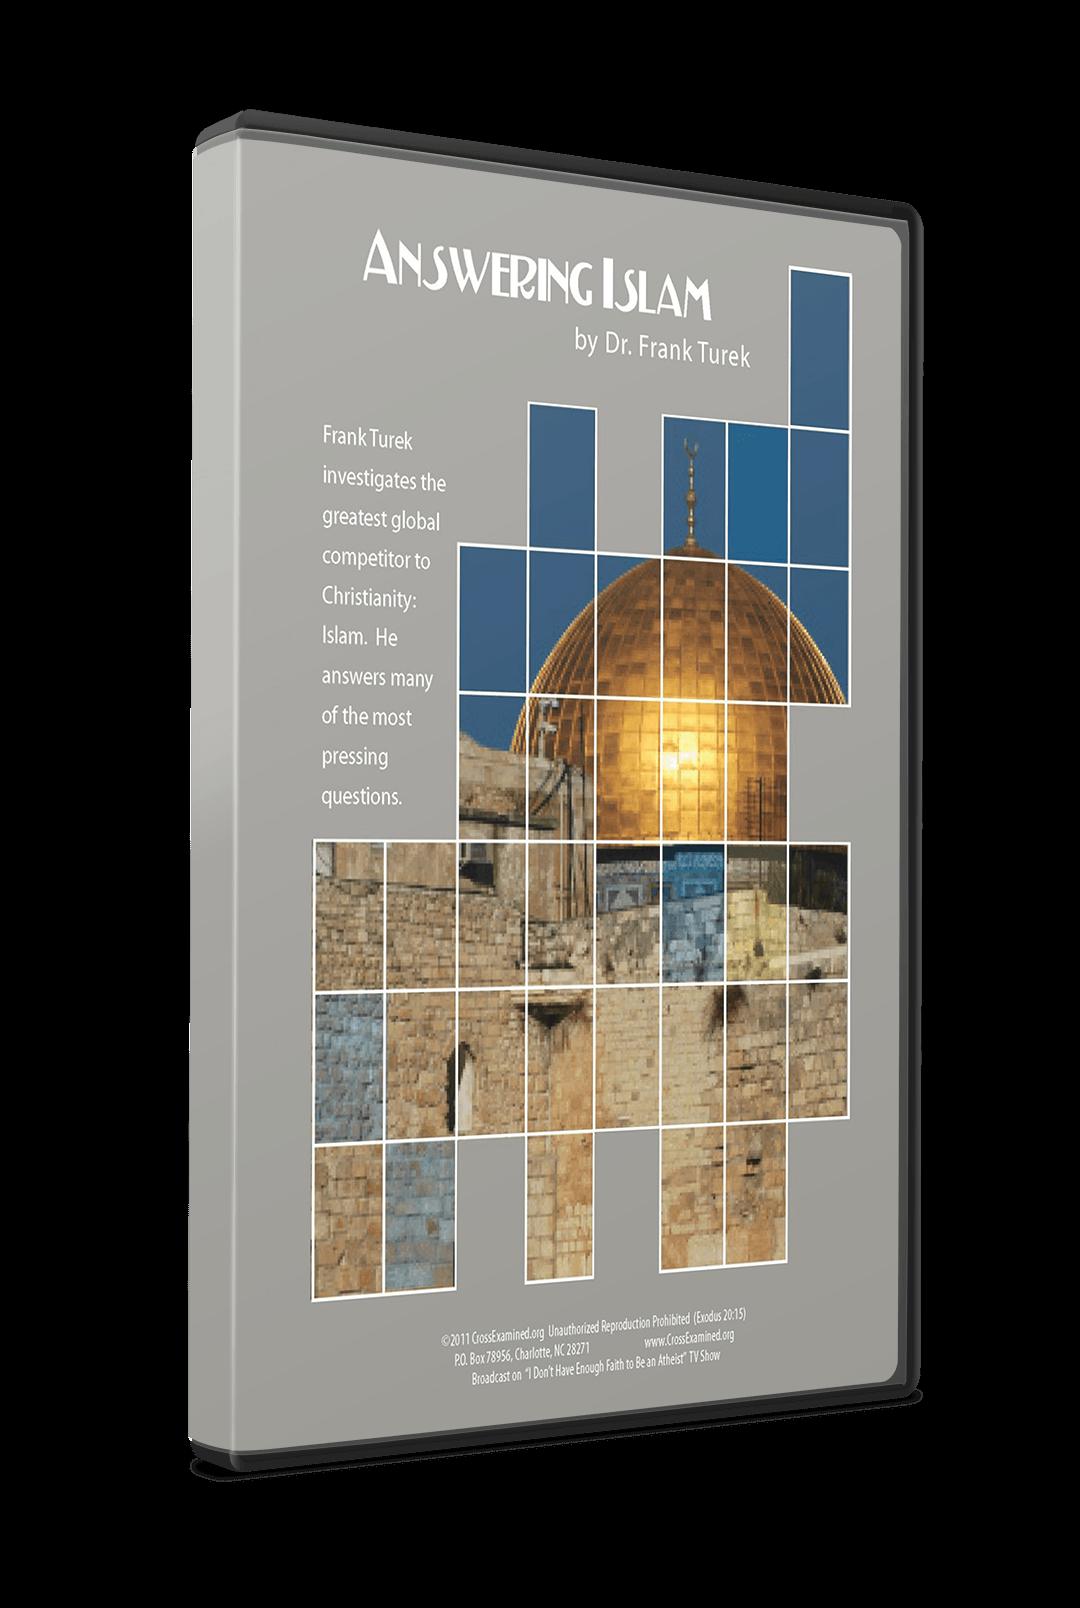 Answering Islam DVD